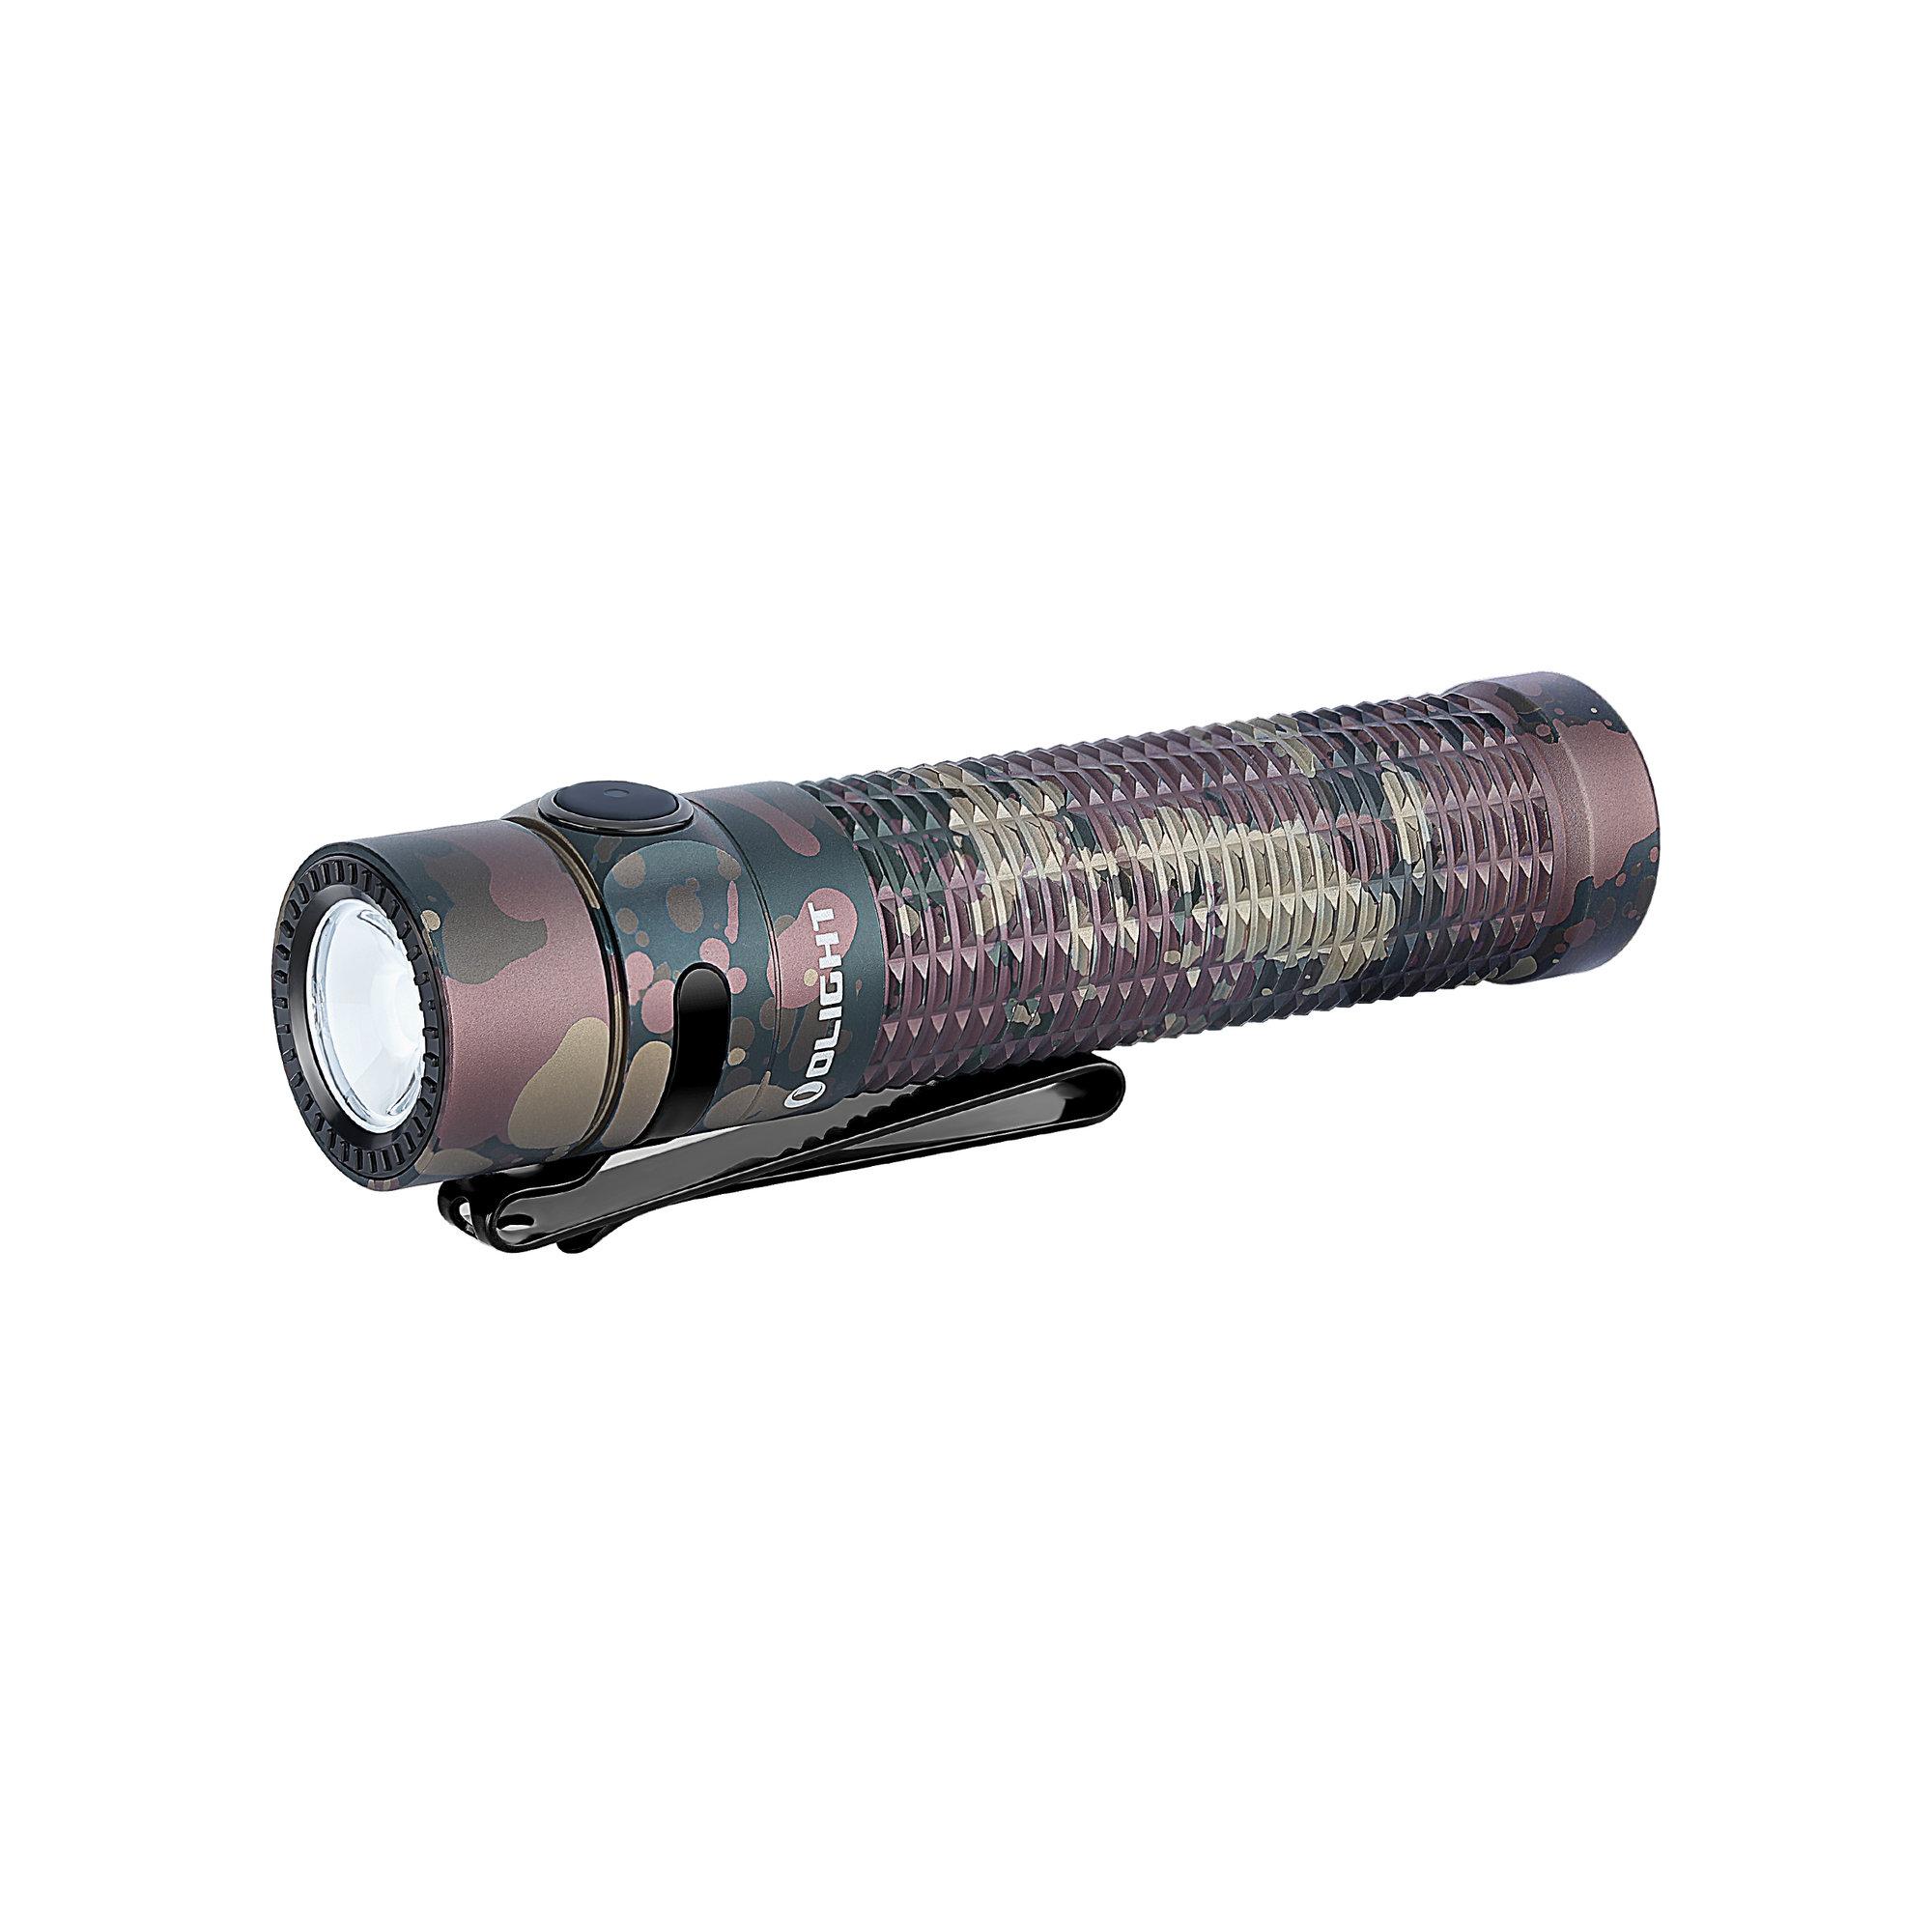 LED baterka Olight Warrior Mini 1500 lm - Kamufláž limitovaná edícia